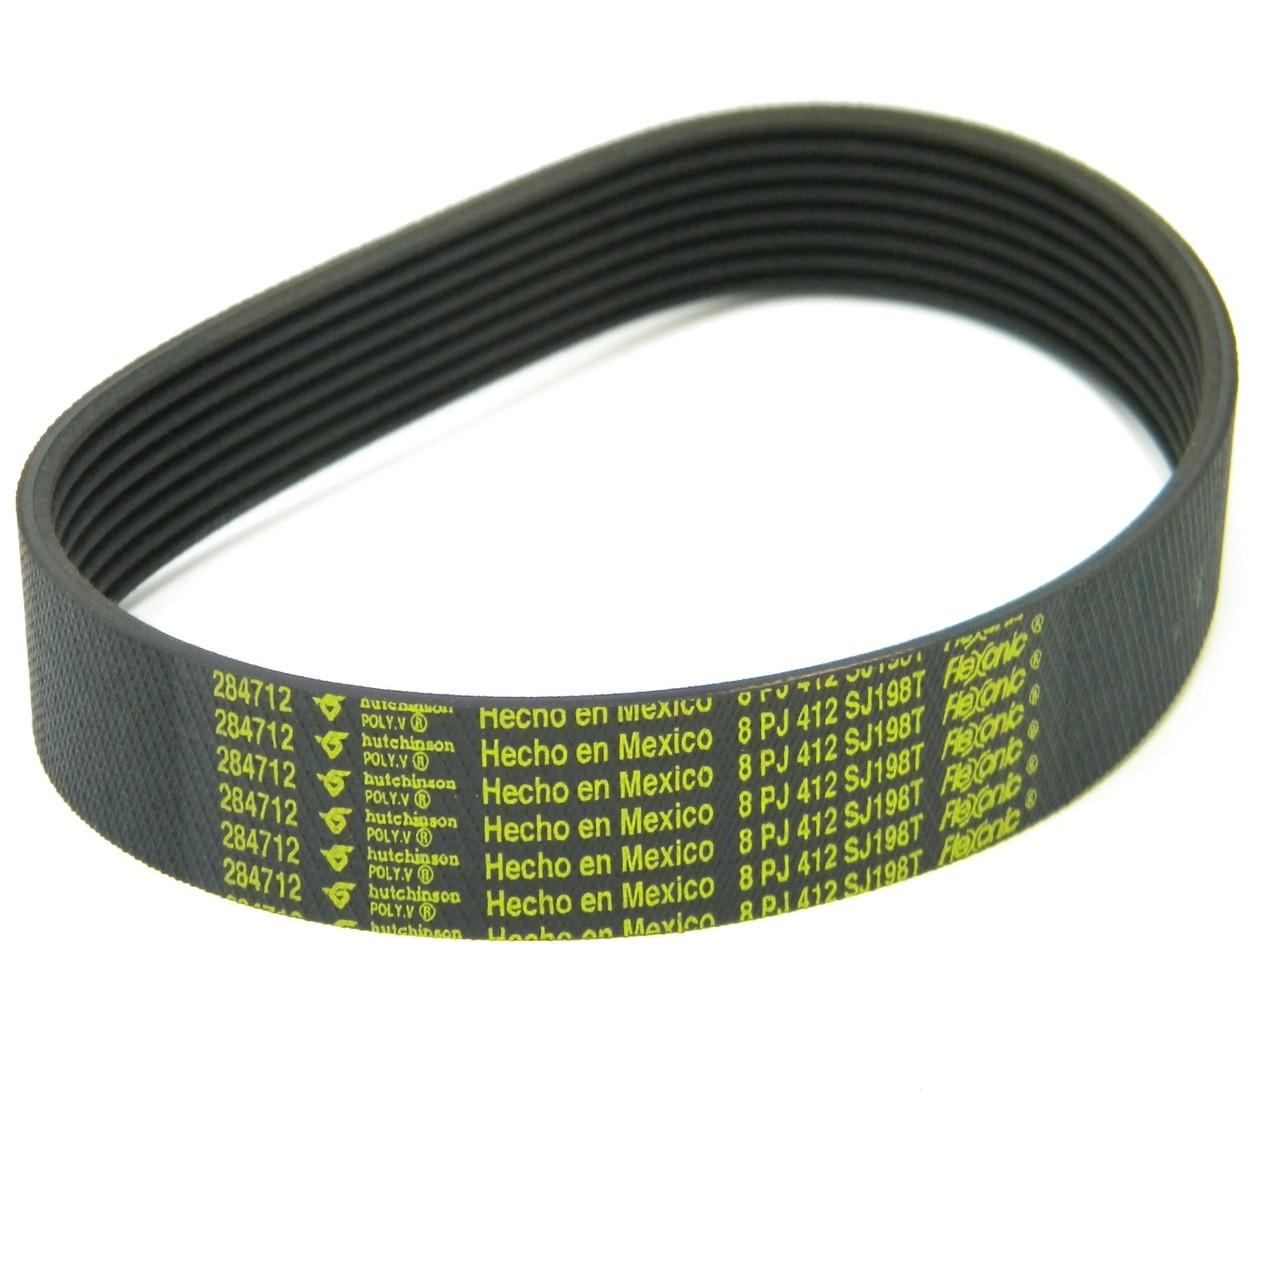 Nordictrack Elite 5700-modèle 249342-Drive Belt